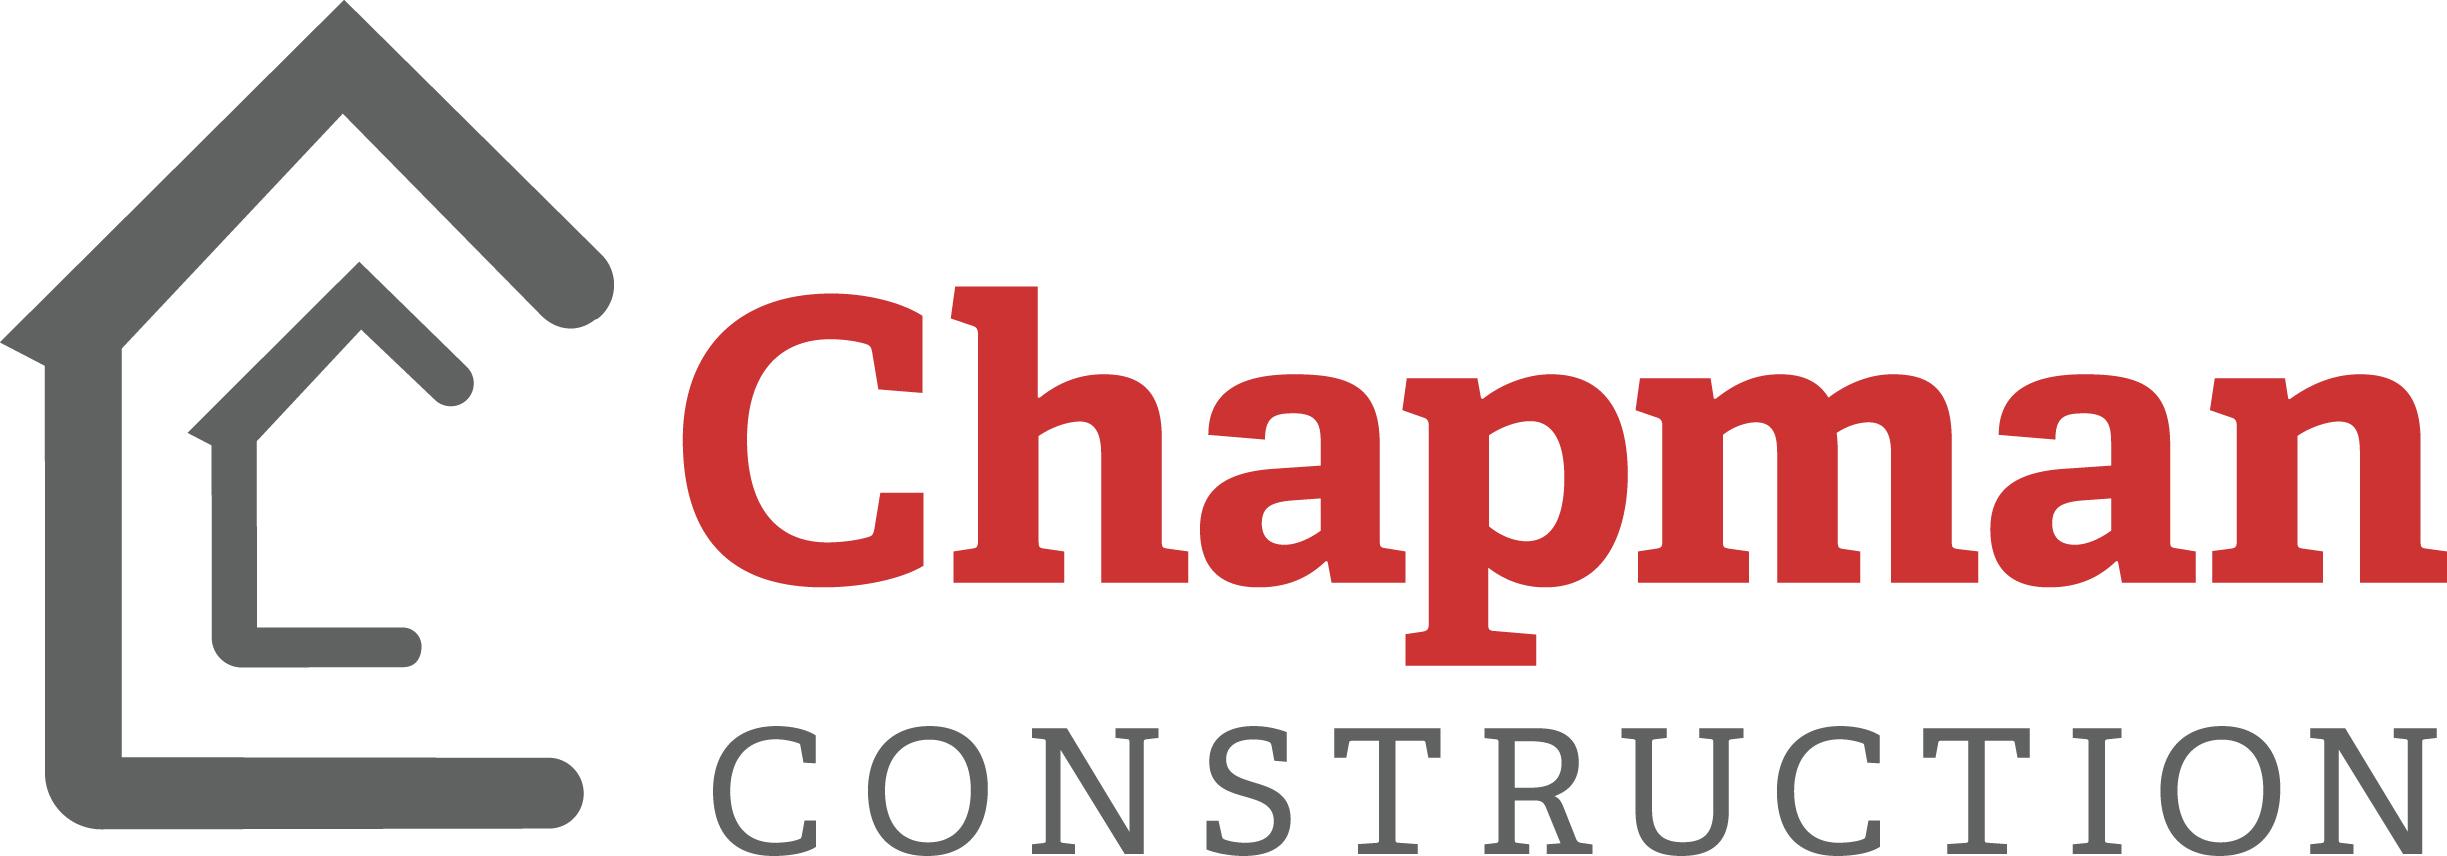 Chapman Construction, LLC logo